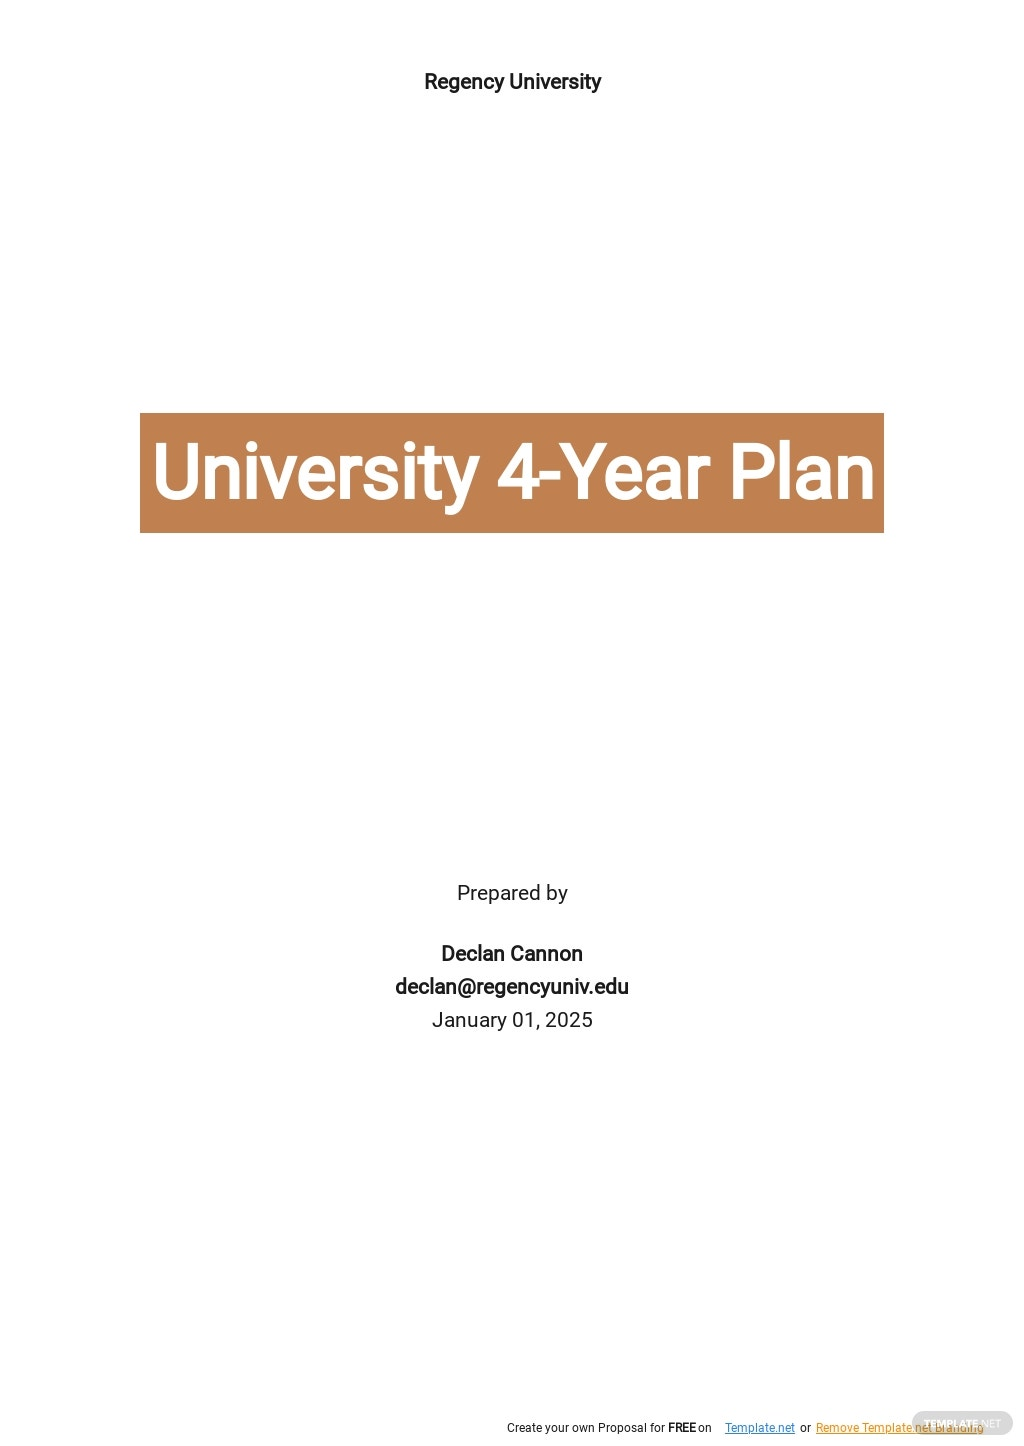 University 4 Year Plan Template